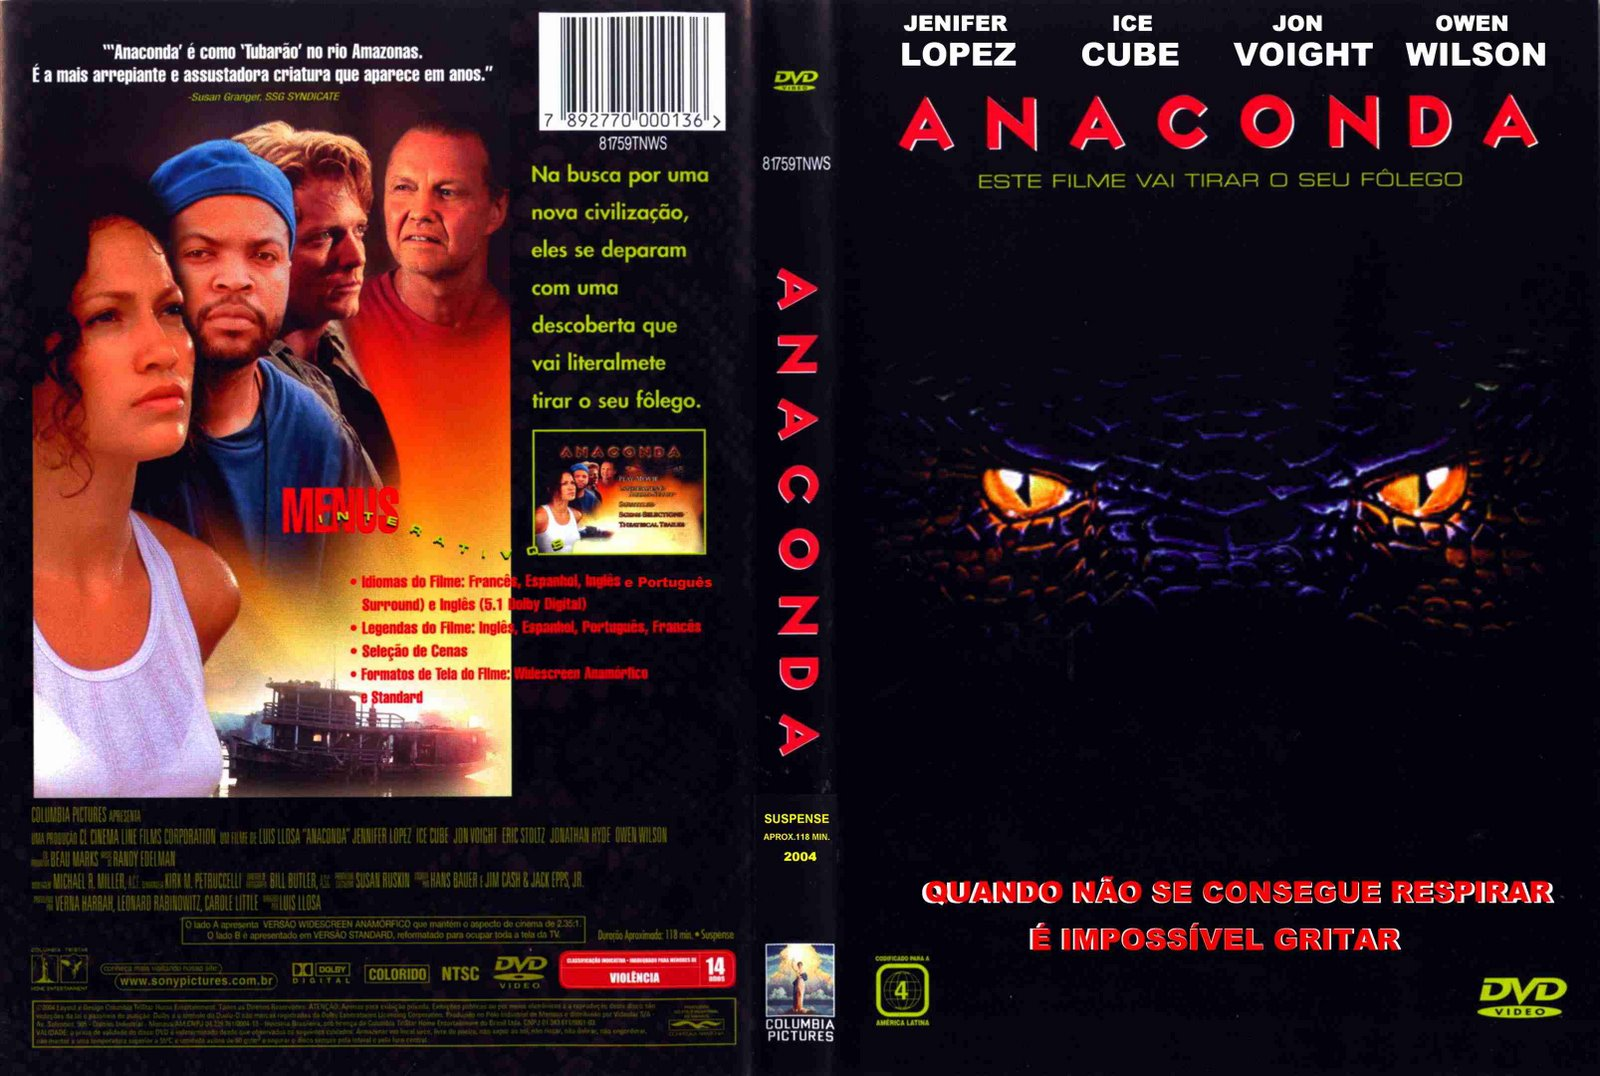 http://1.bp.blogspot.com/-L2tXK-IsACQ/Ti5BVvR3f_I/AAAAAAAAAA0/hYQabBz__7g/s1600/04+-+Anaconda+1+capa.jpg